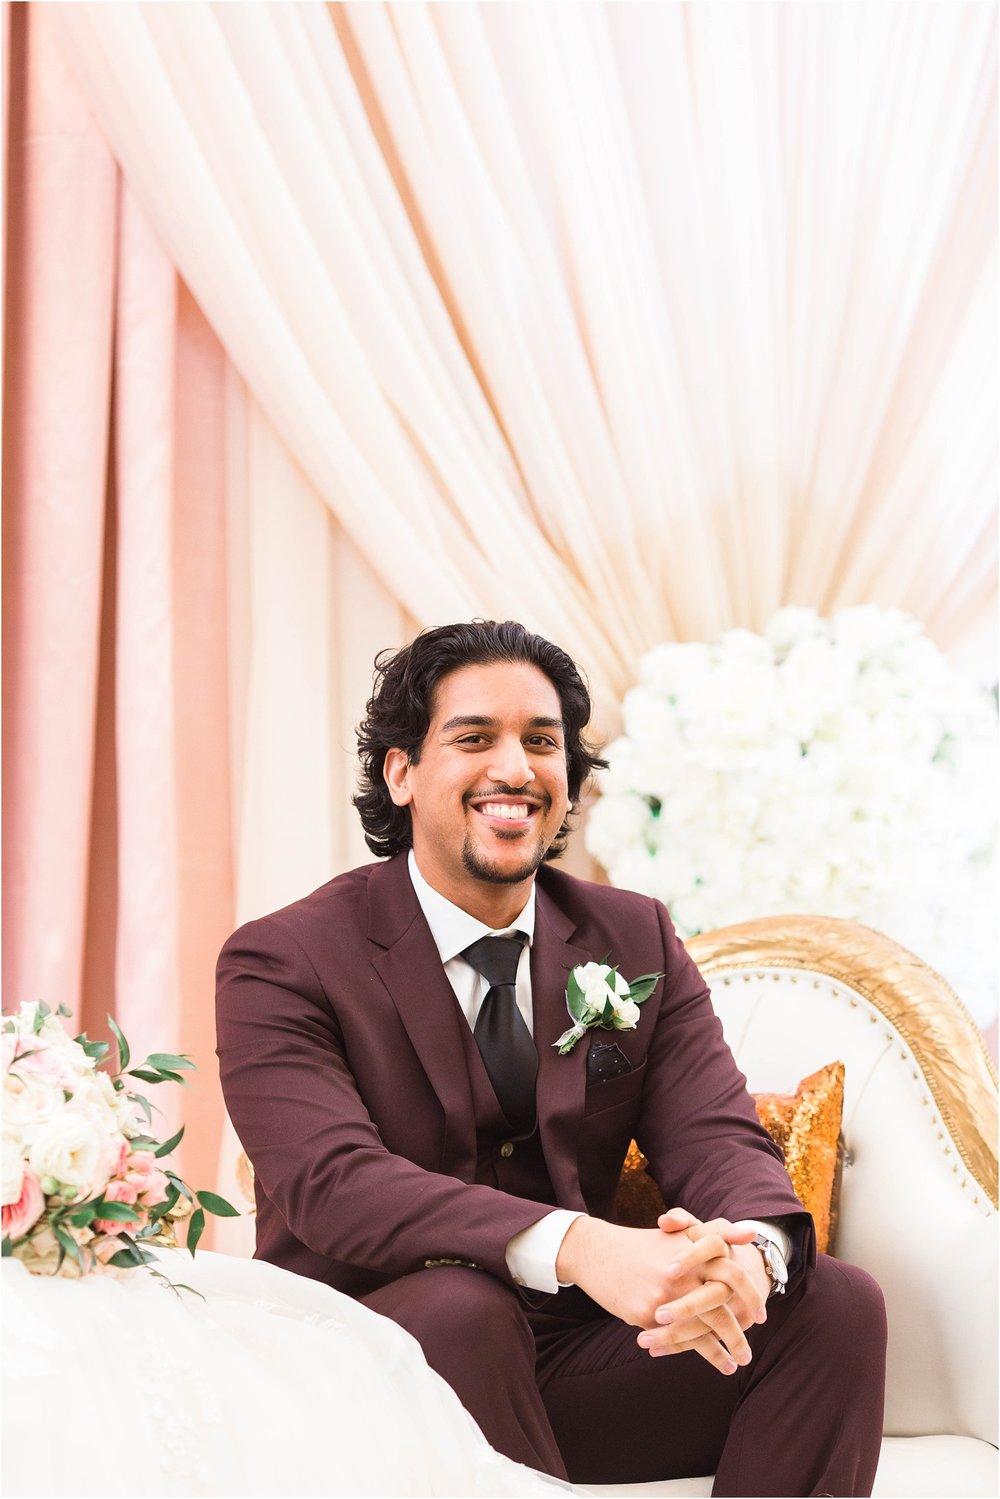 Red-Rose-Convention-Mint-Room-Wedding-Toronto-Mississauga-Brampton-Scarborough-GTA-Pakistani-Indian-Wedding-Engagement-Photographer-Photography_0135.jpg